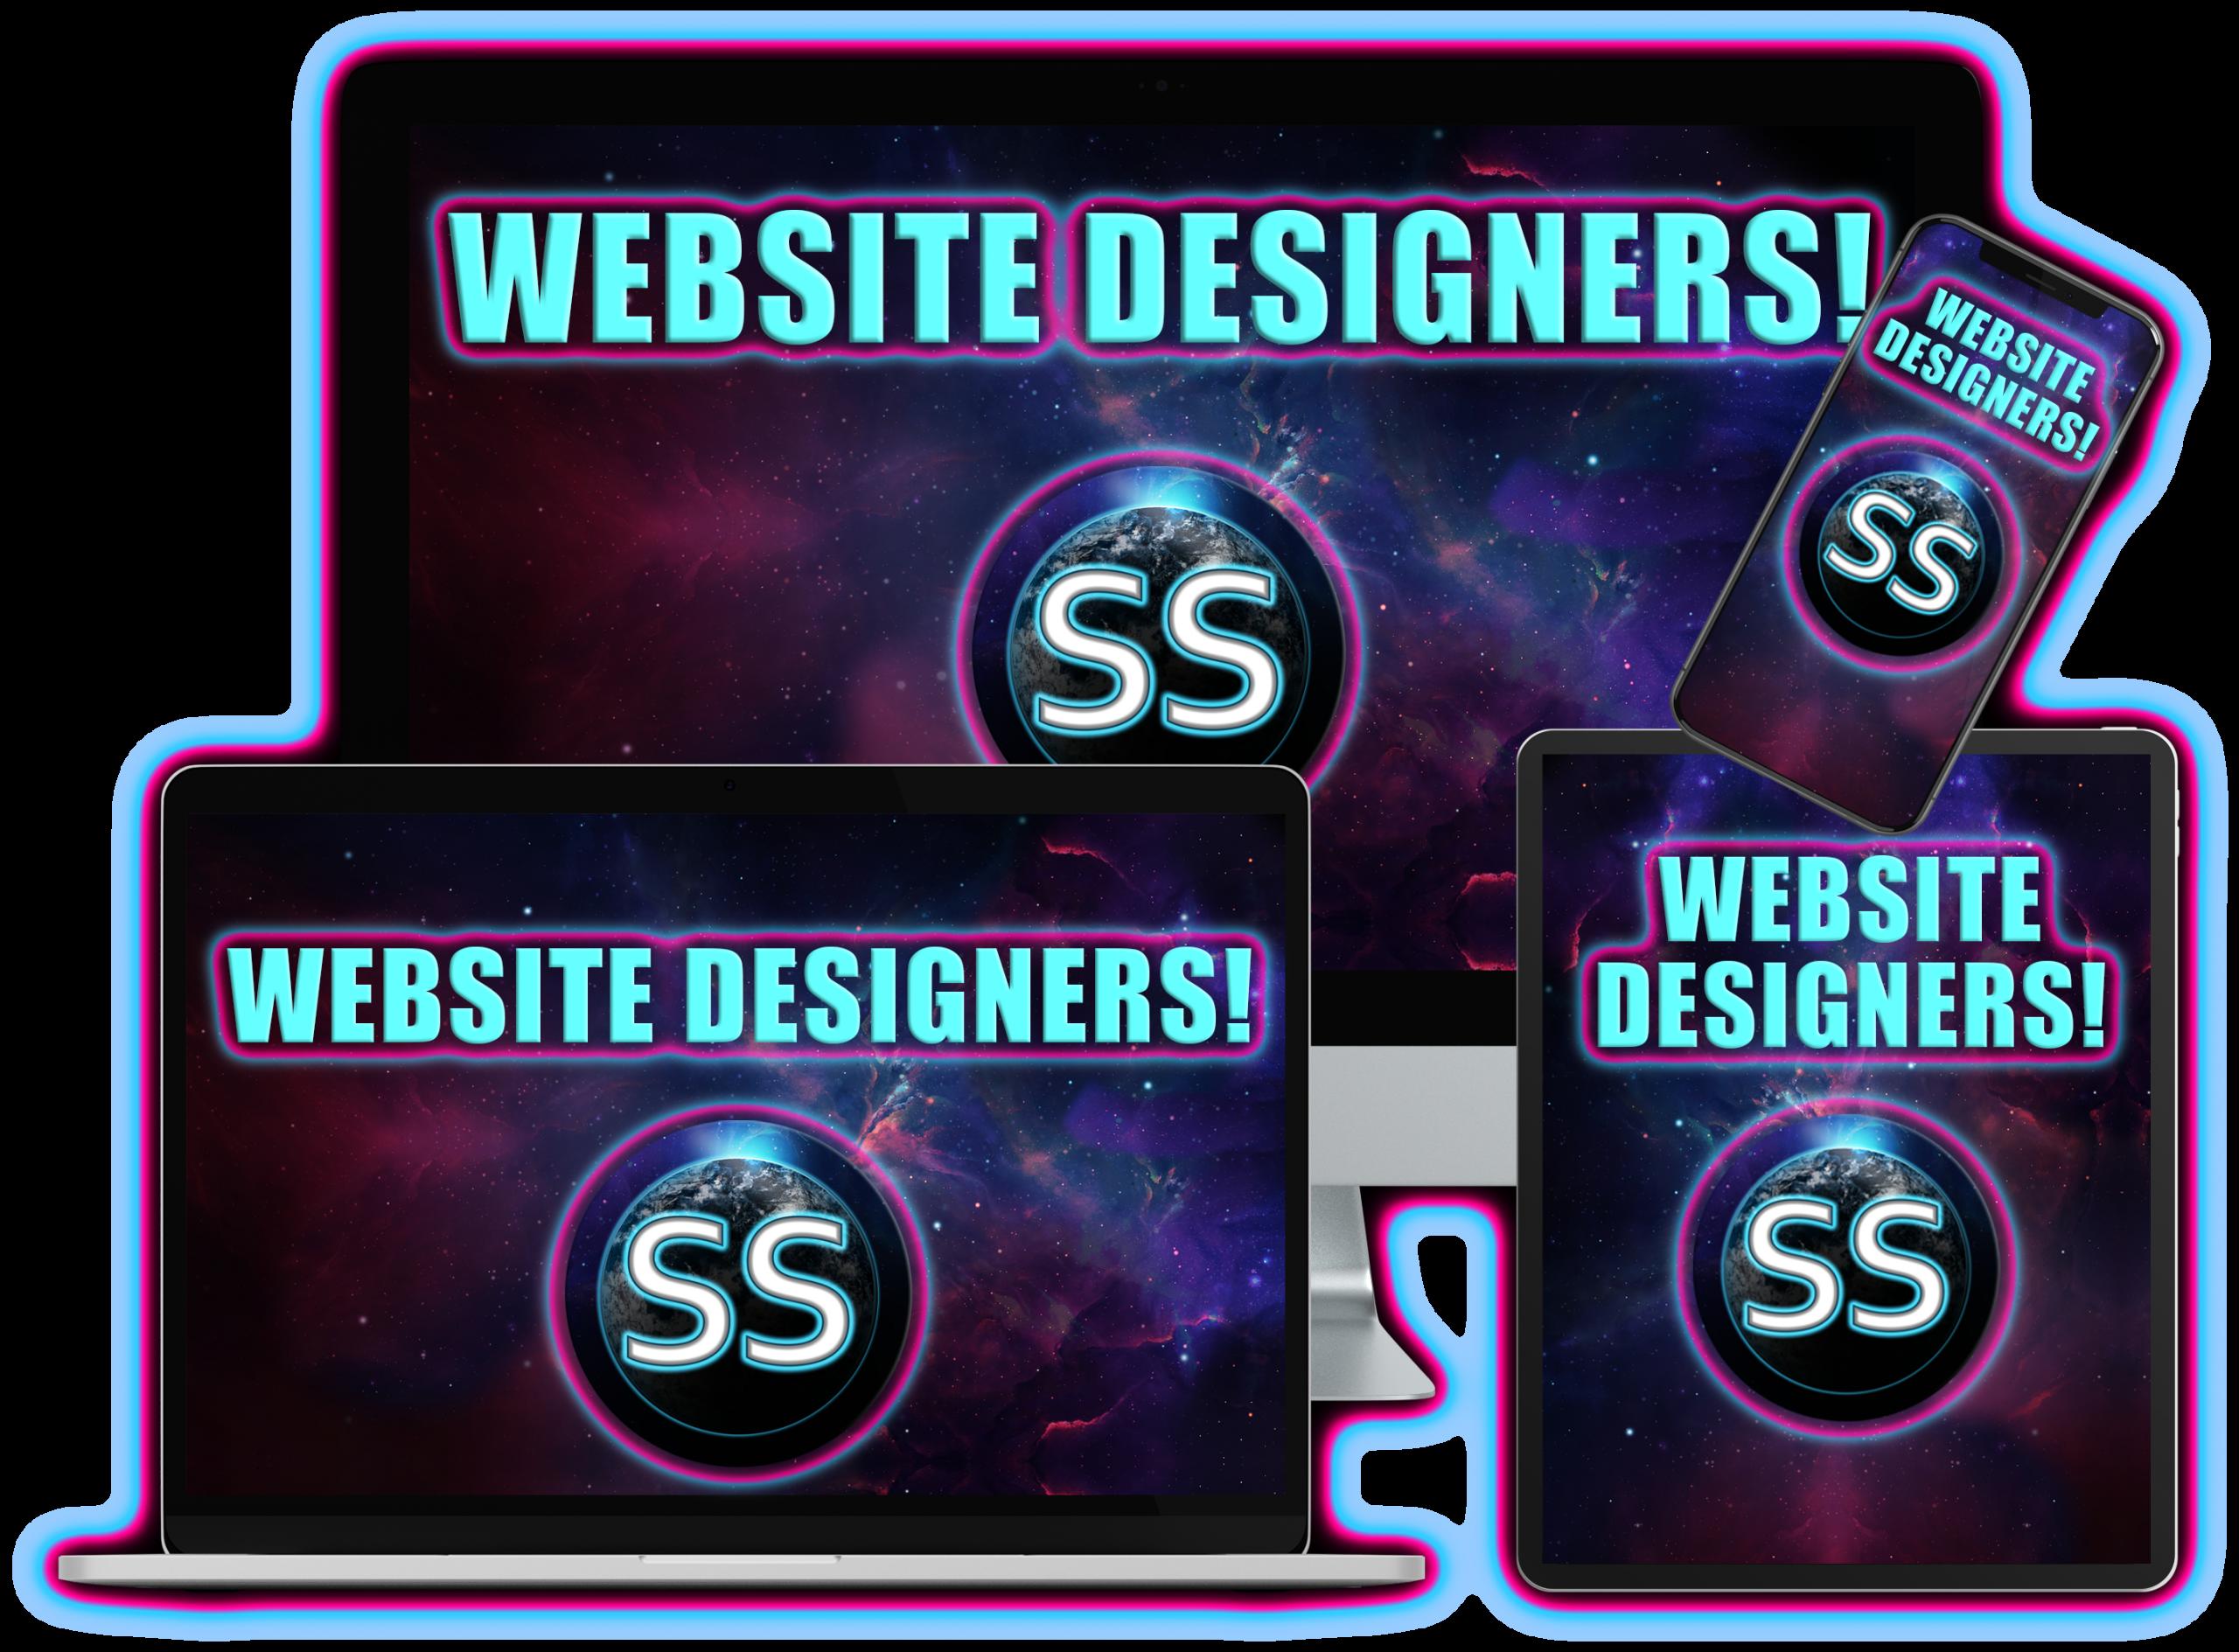 website designers in houston texas nassau bay texas 1